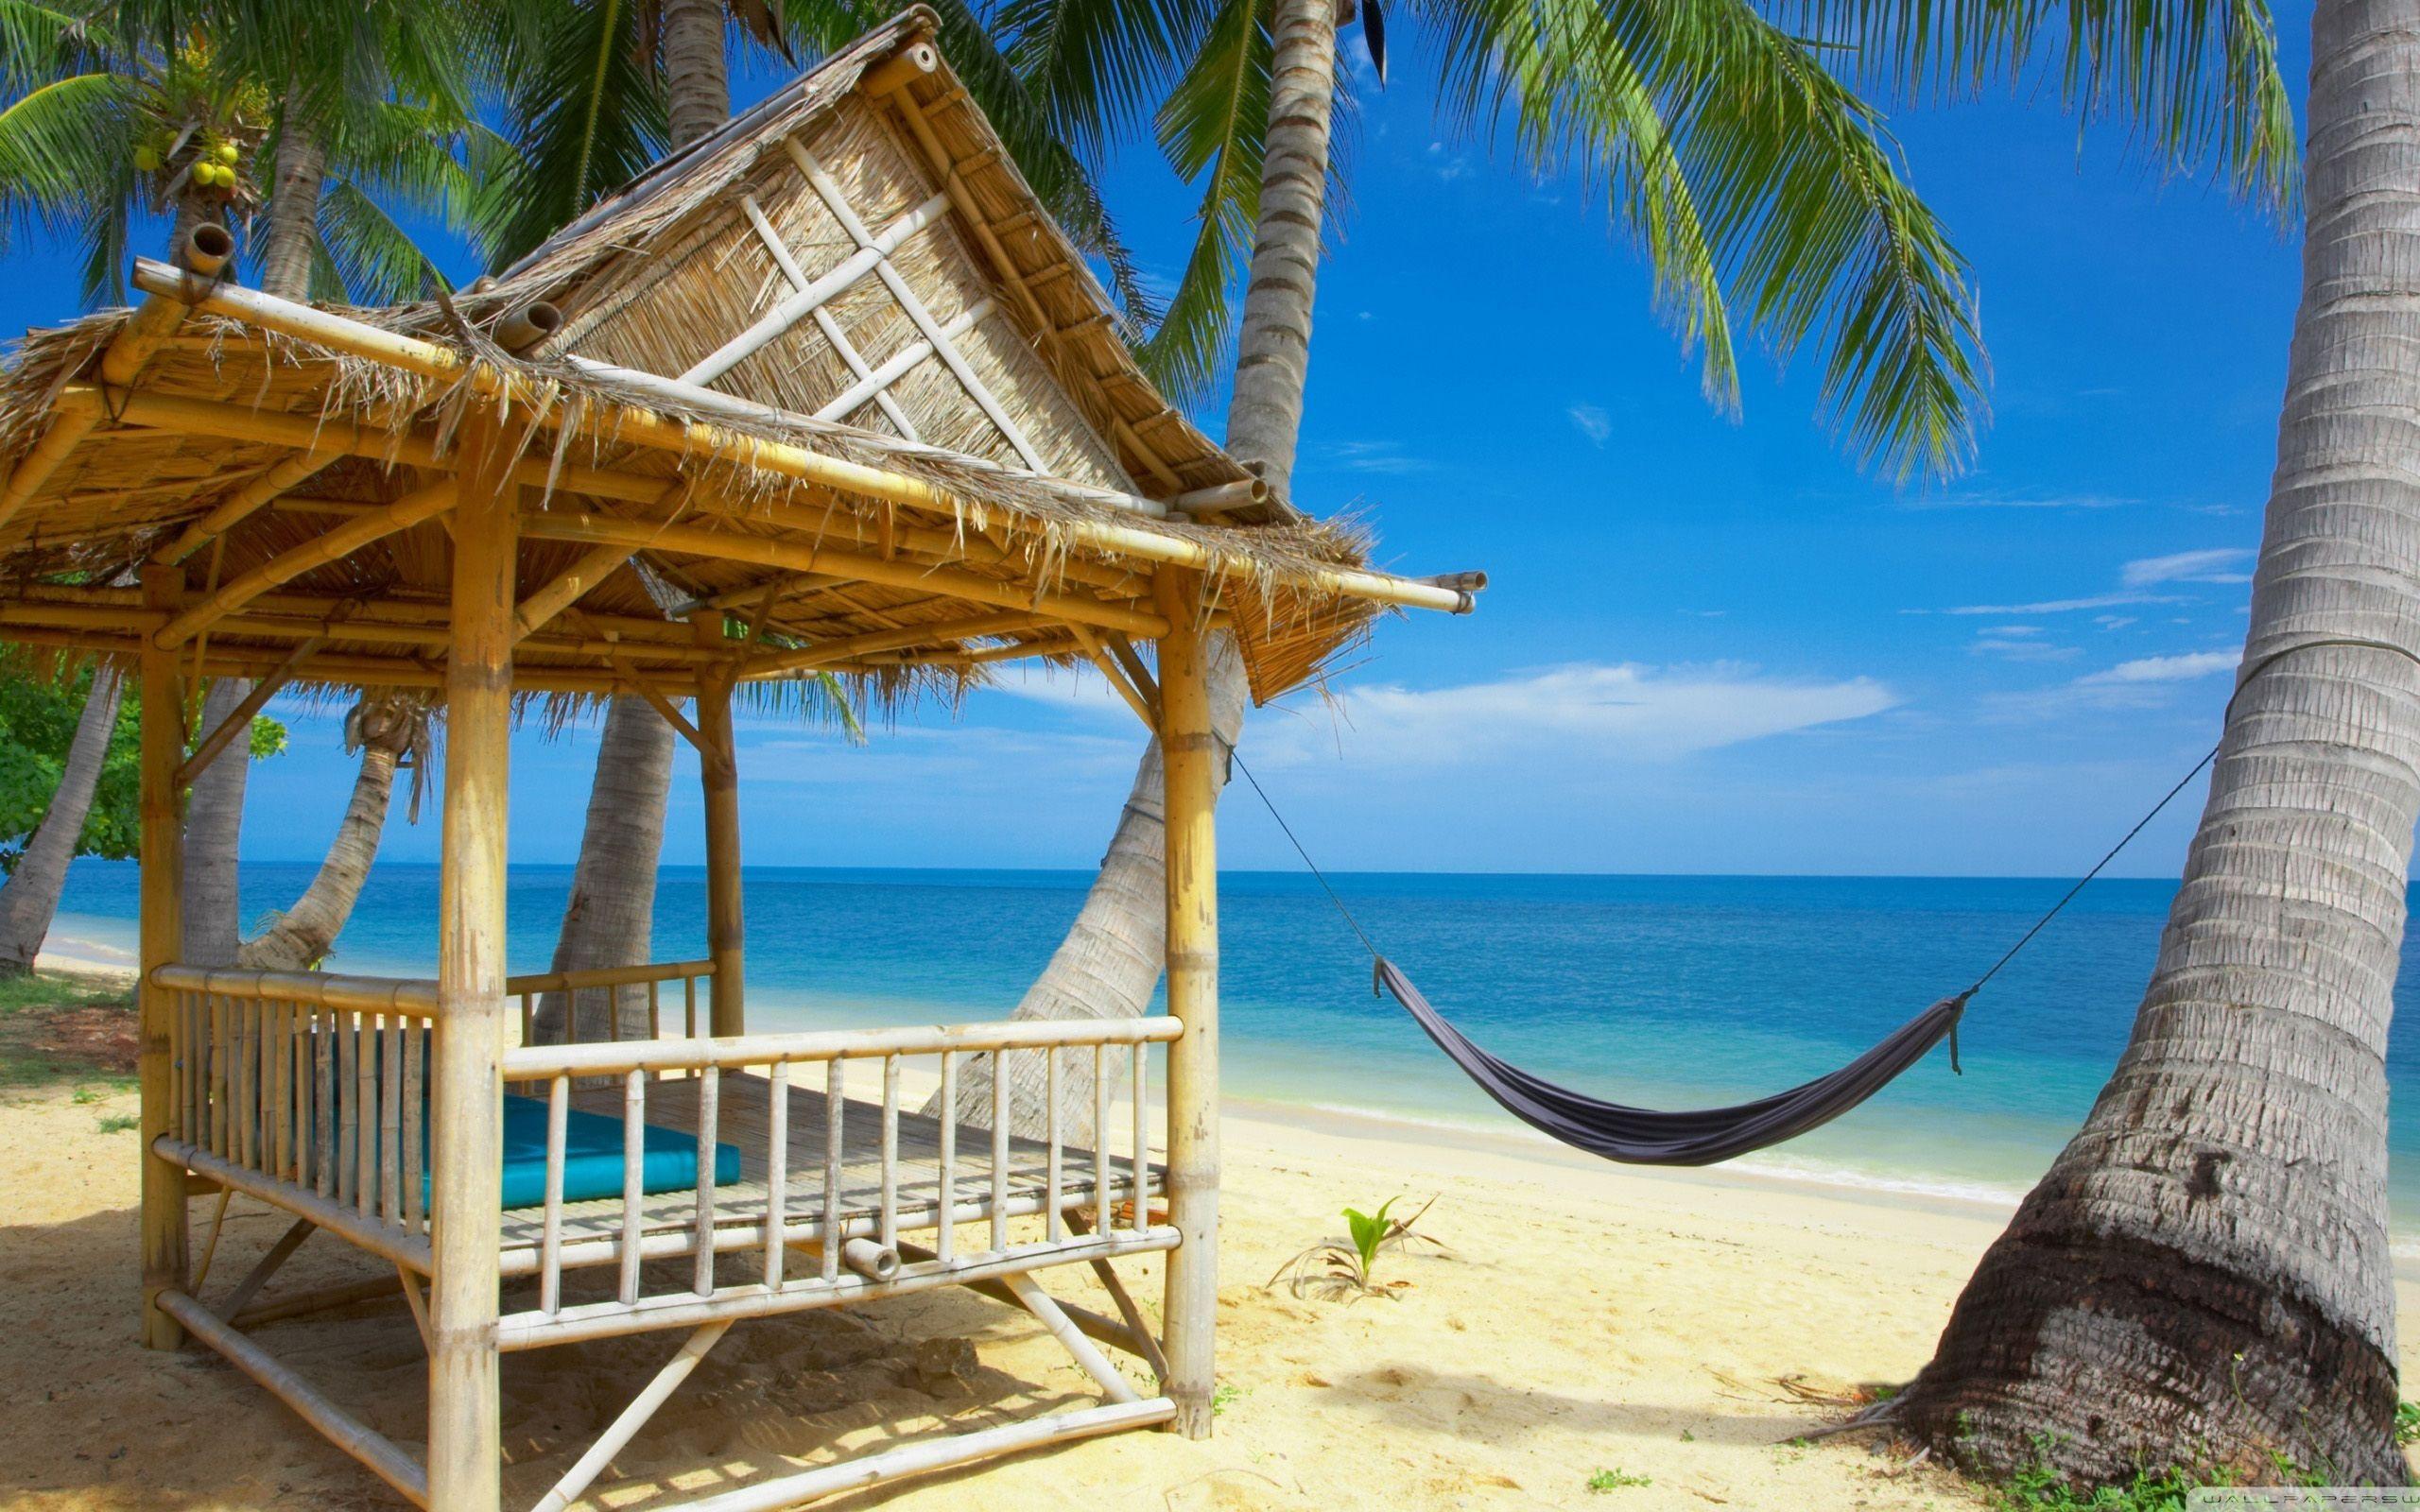 Palm Tree Beach Hammock At The Tropics Wallpaper (2560 1600)